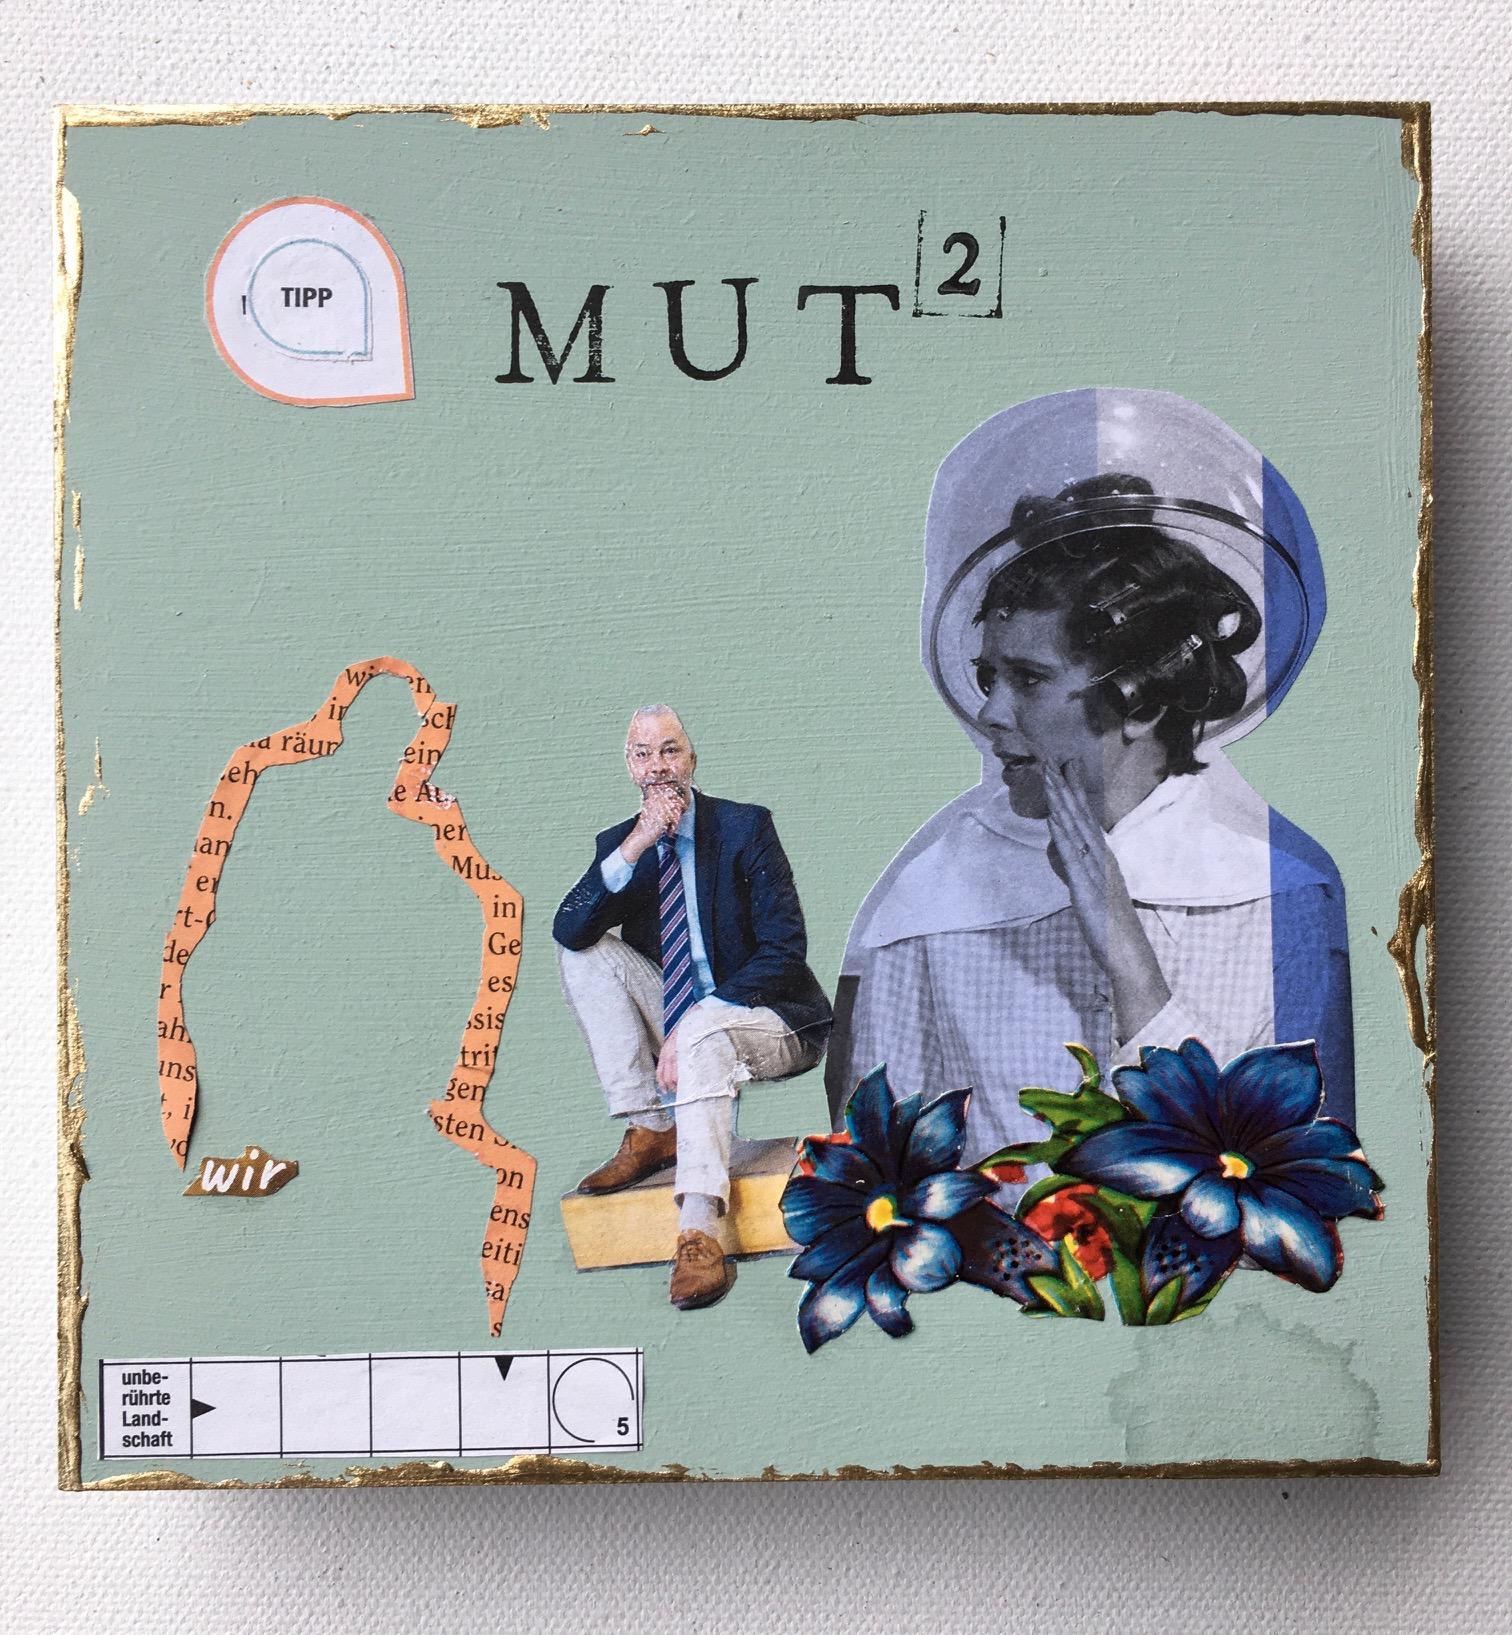 Teena Leitow, MutHoch2, Collaboration Art, CoronART, Kunstprojekt